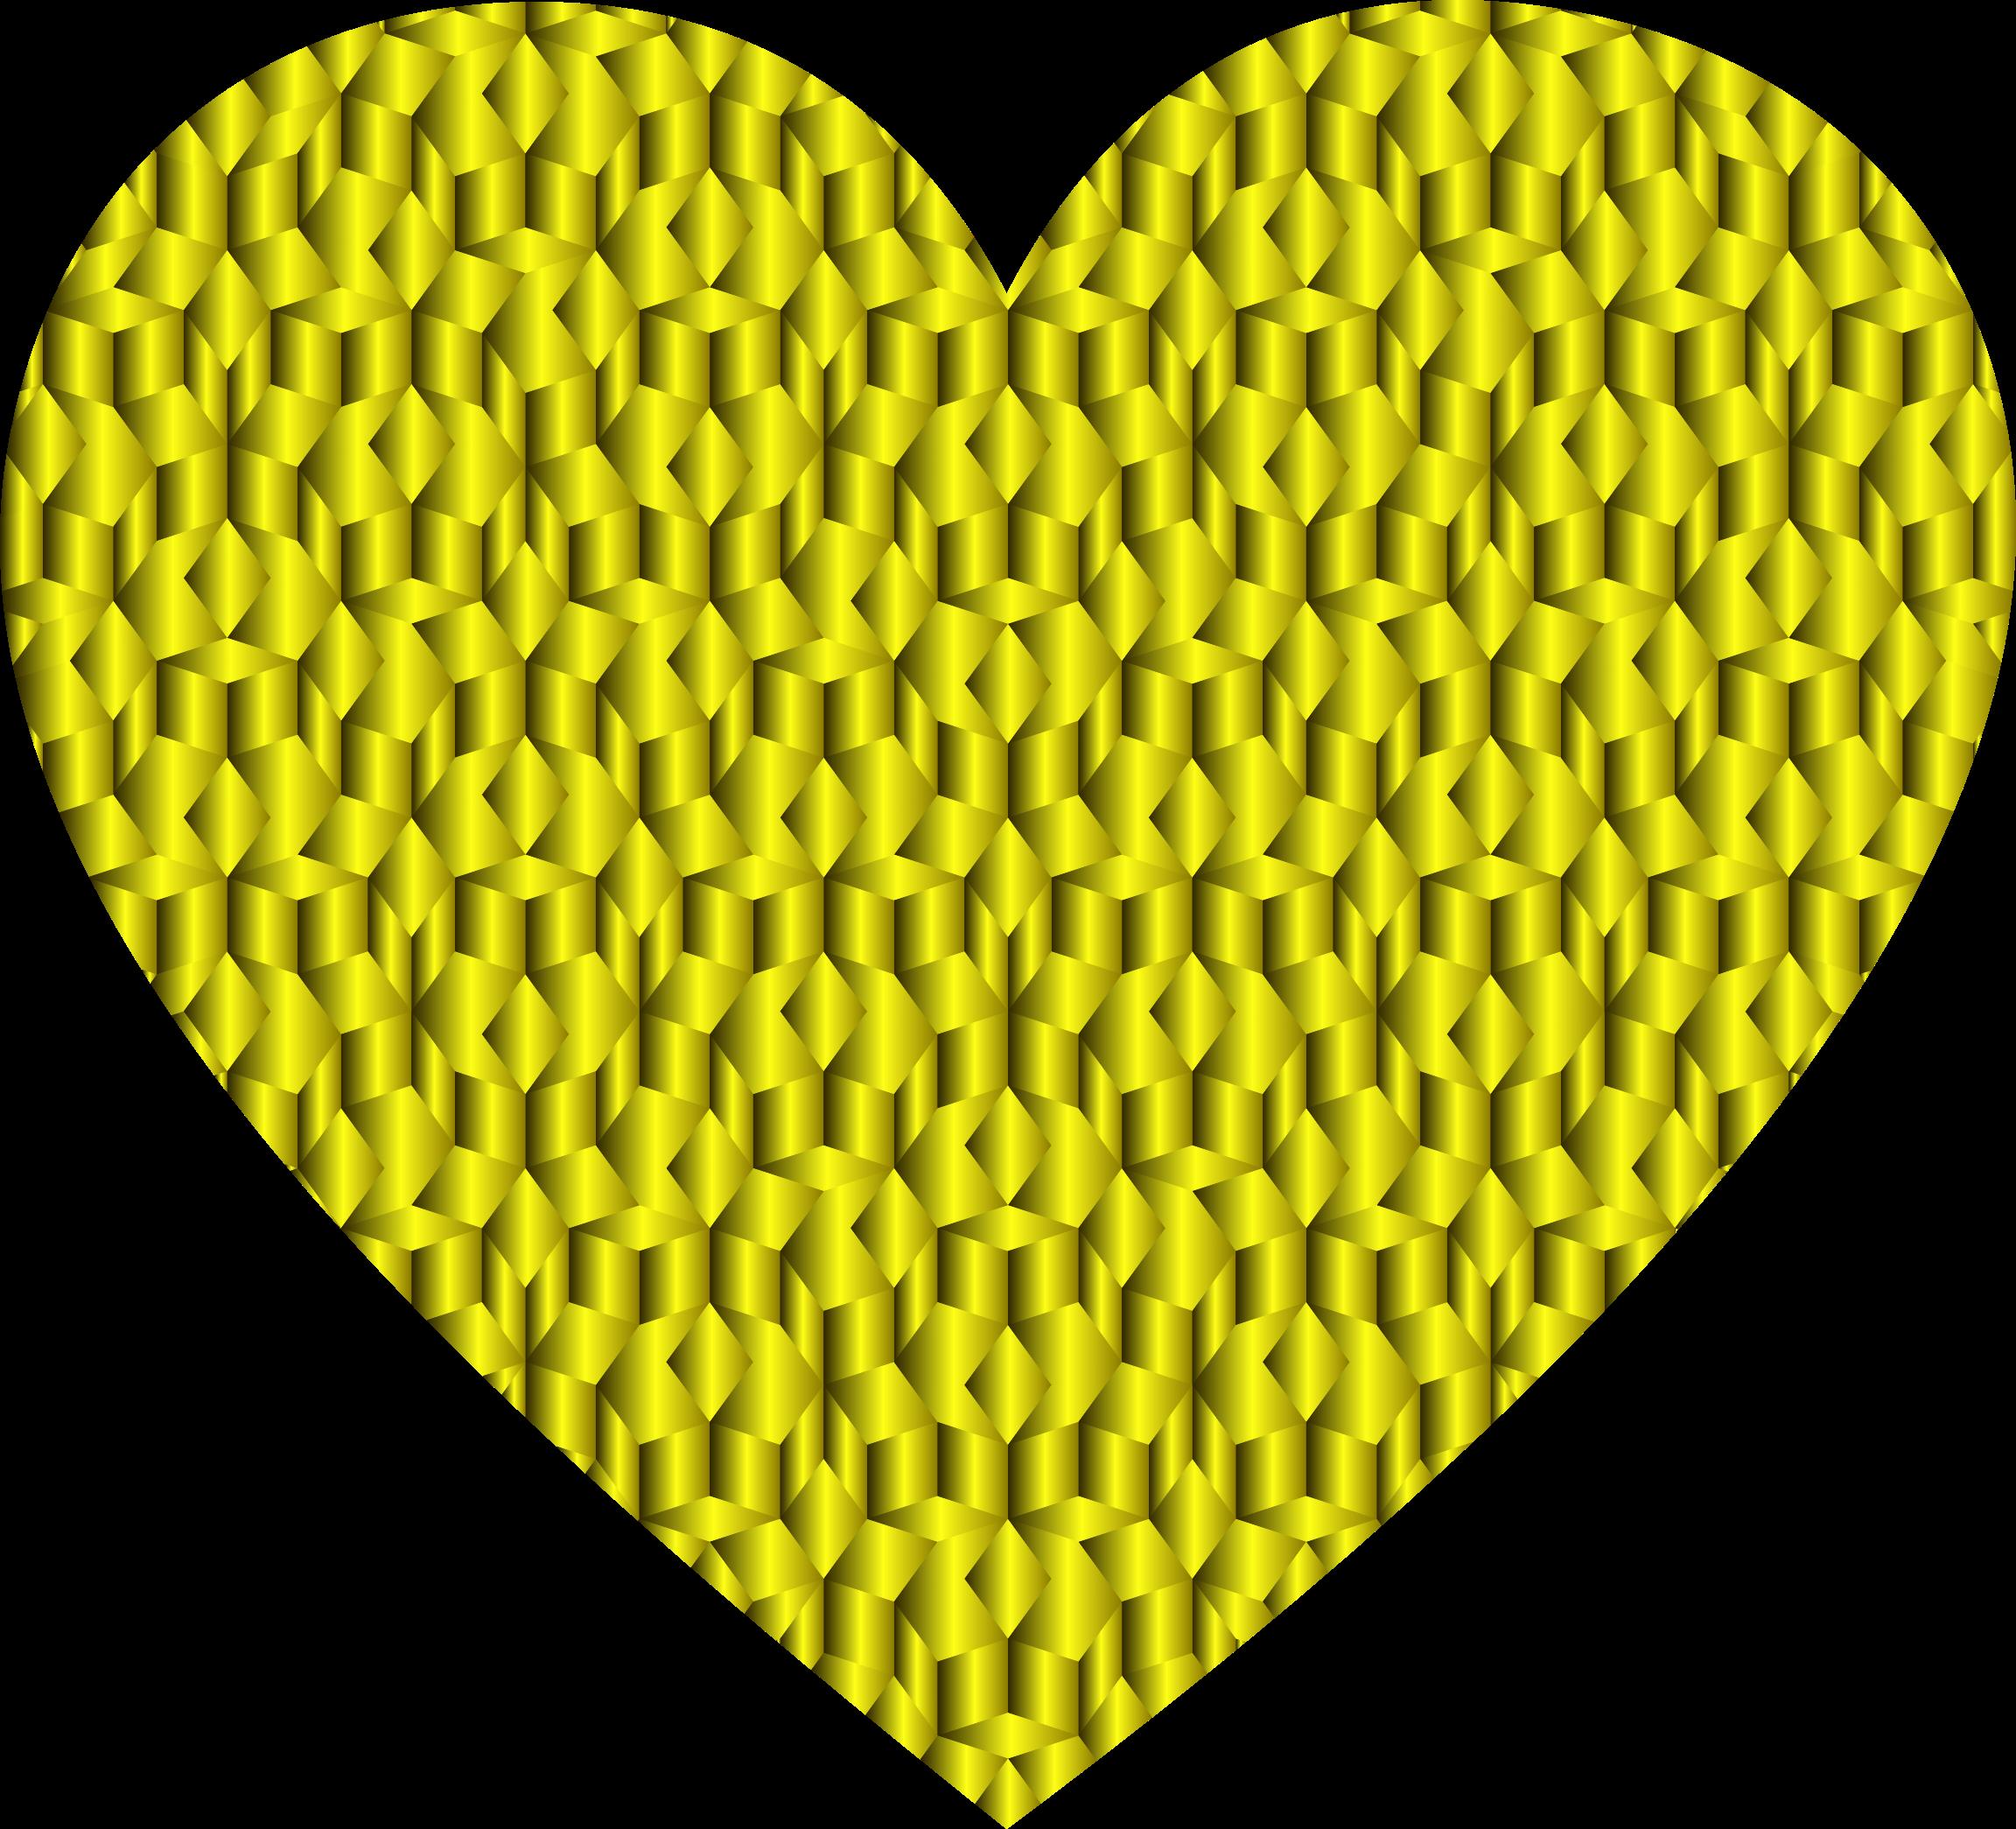 Clipart heart doily. Prismatic penrose variation big